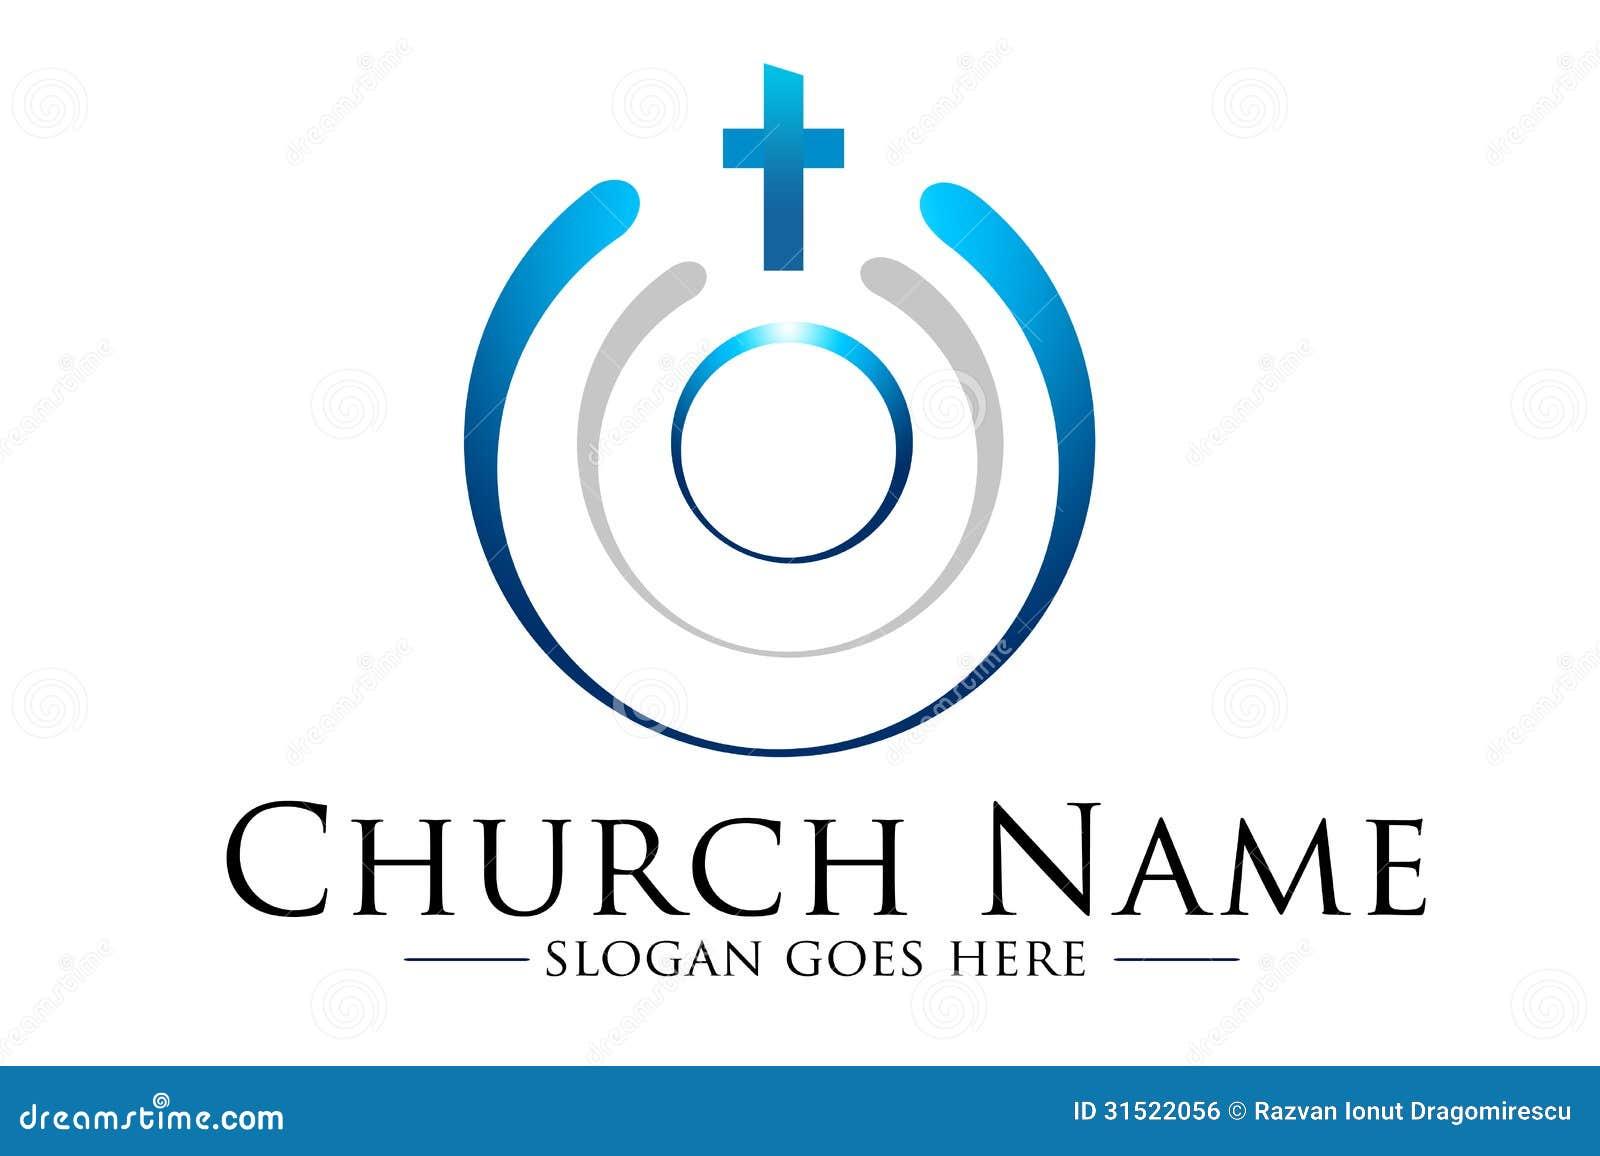 Church Logo Royalty Free Stock Photos - Image: 31522078